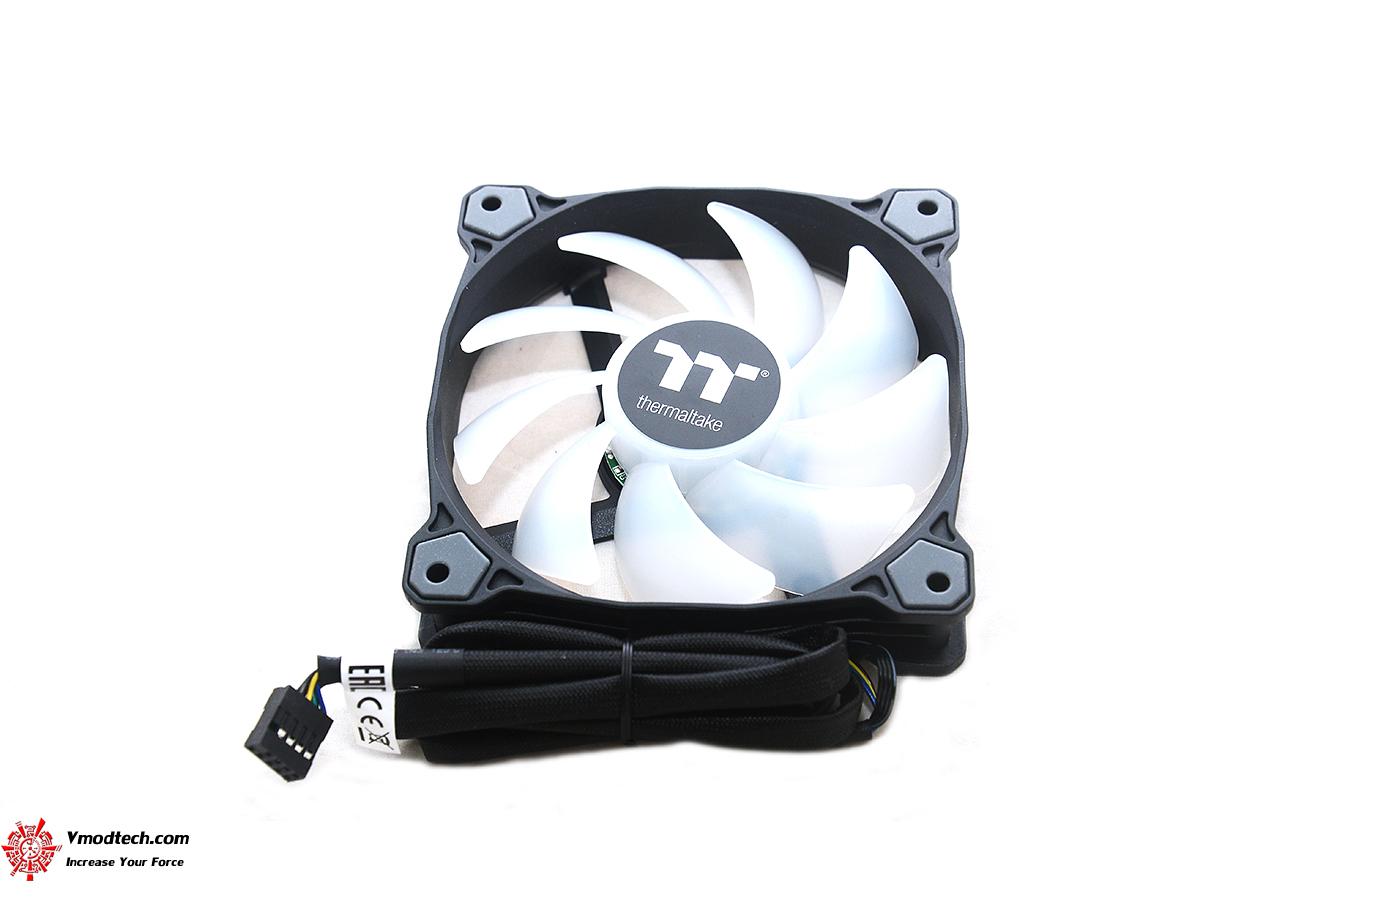 dsc 8819 Thermaltake Pure Plus 12 LED RGB Radiator Fan TT Premium Edition (3 Fan Pack) Review